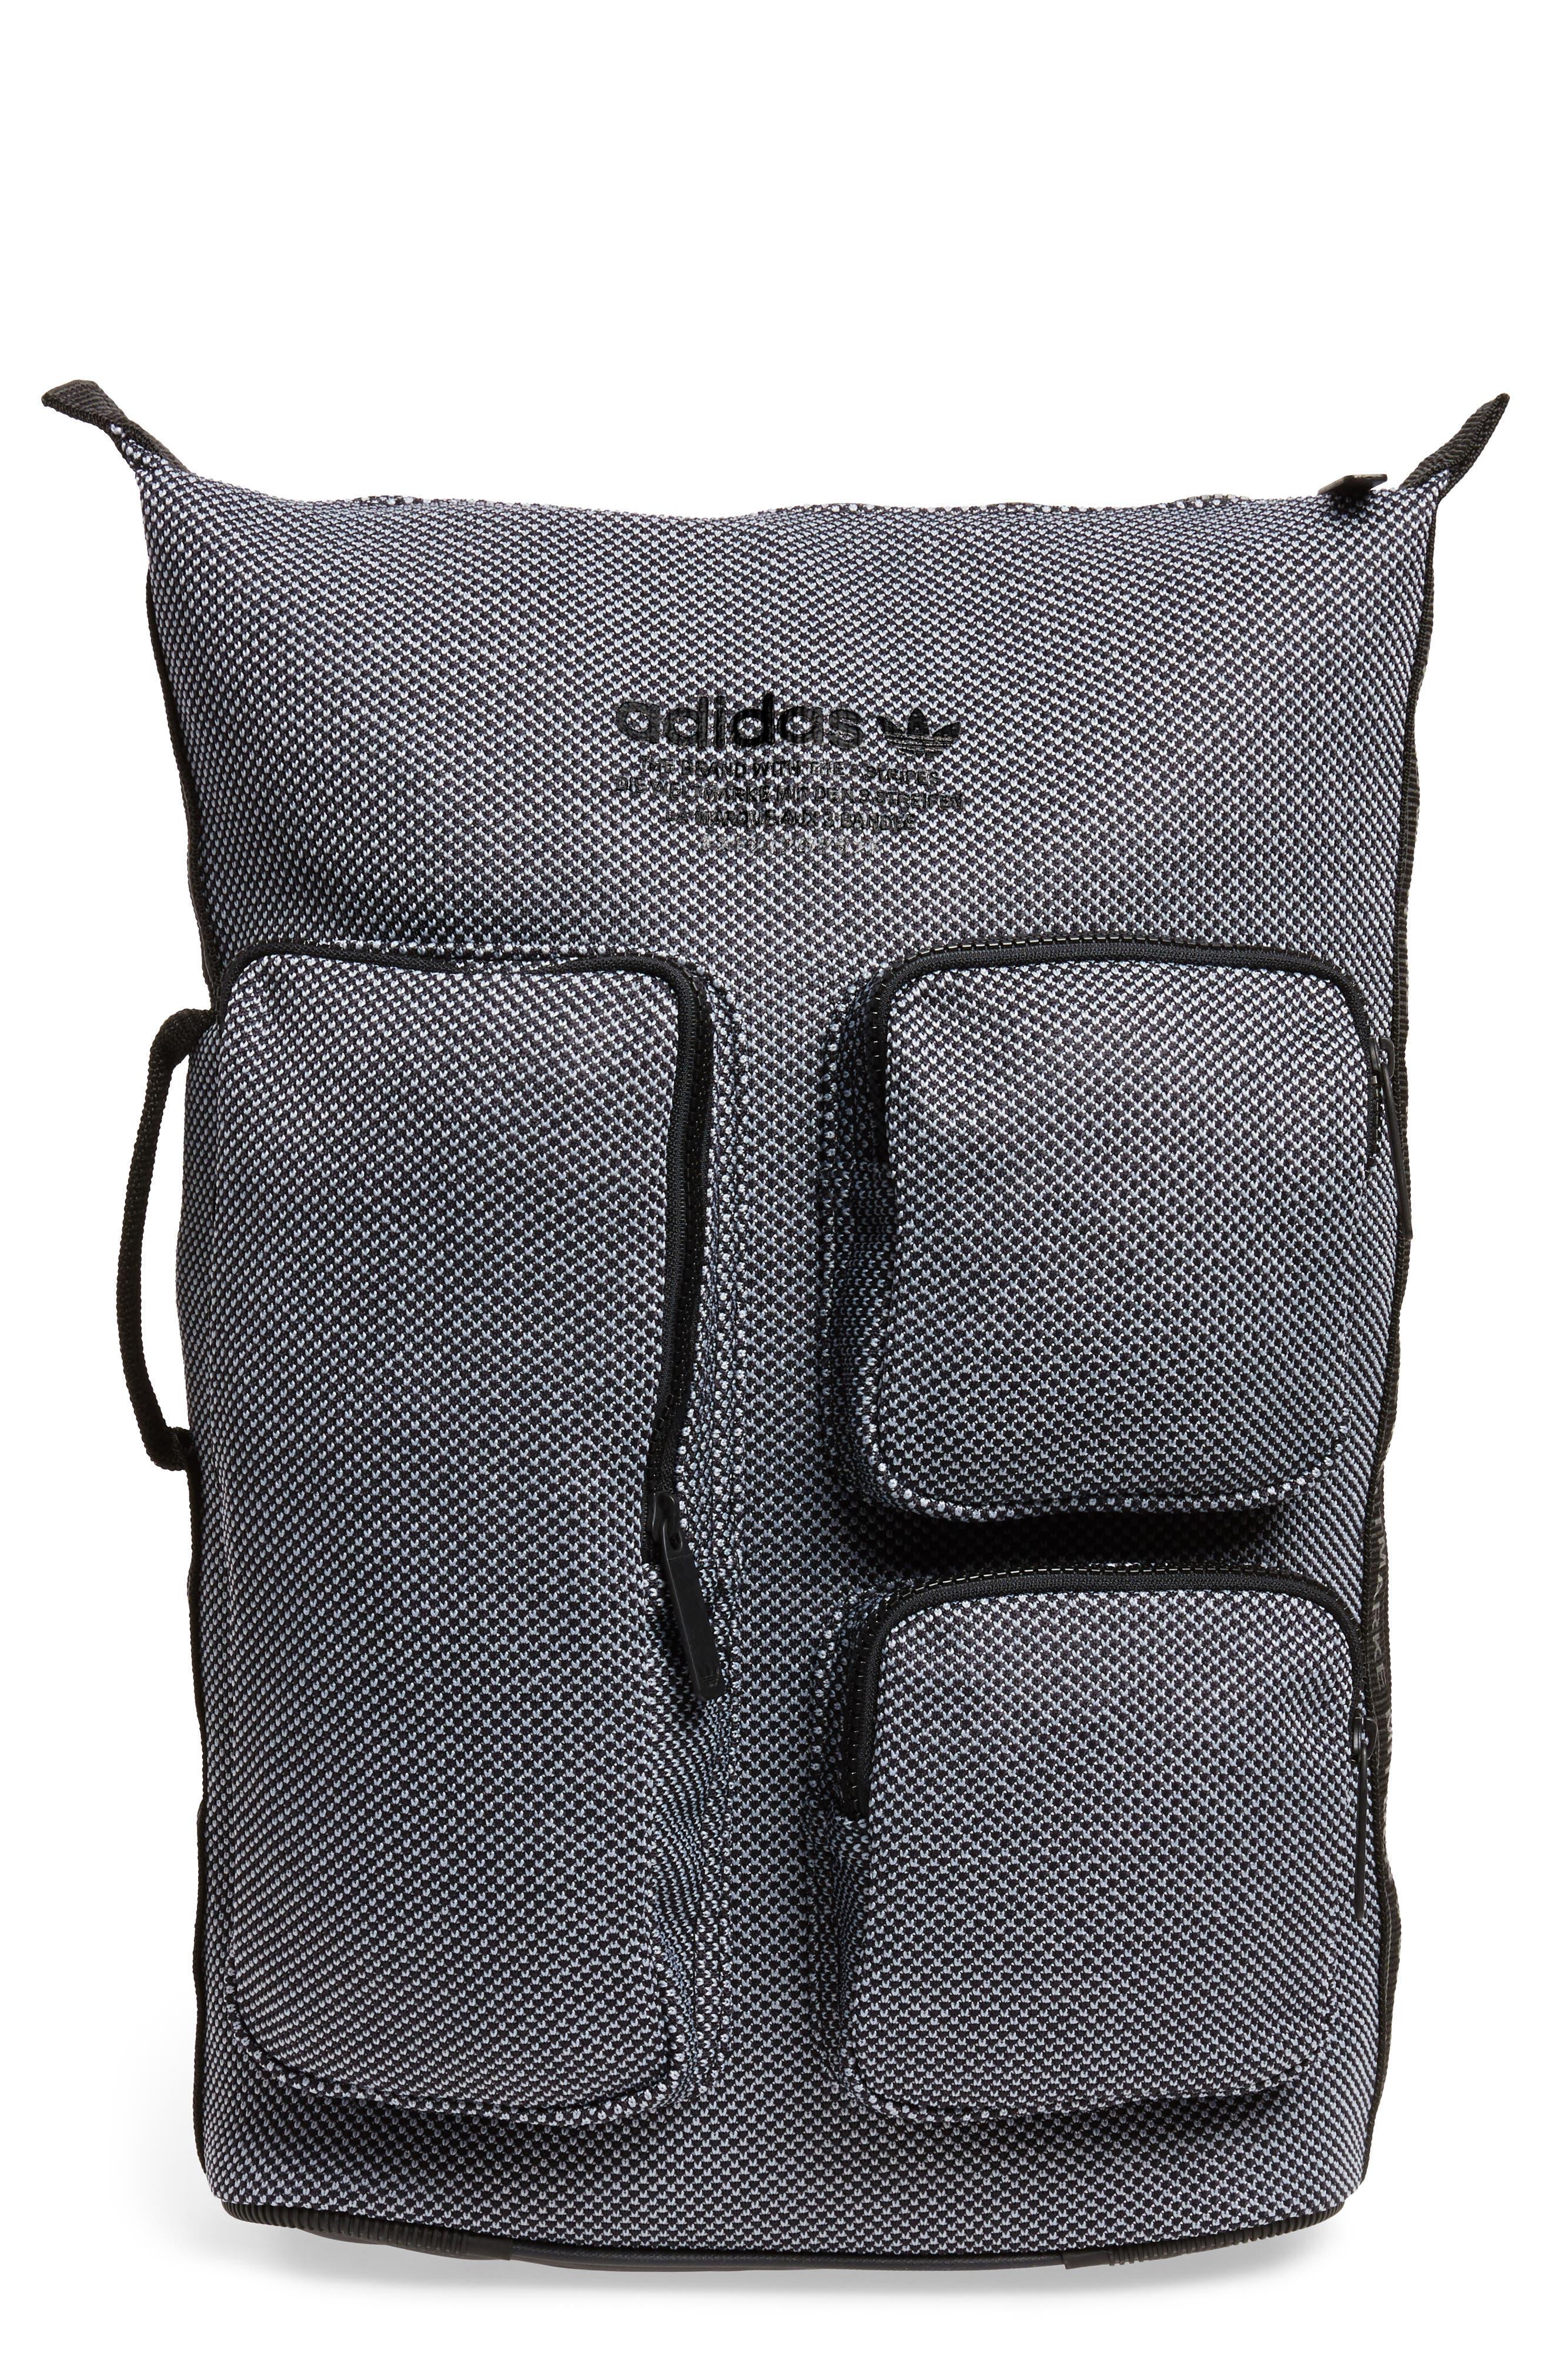 adidas Originals NMD Day Backpack